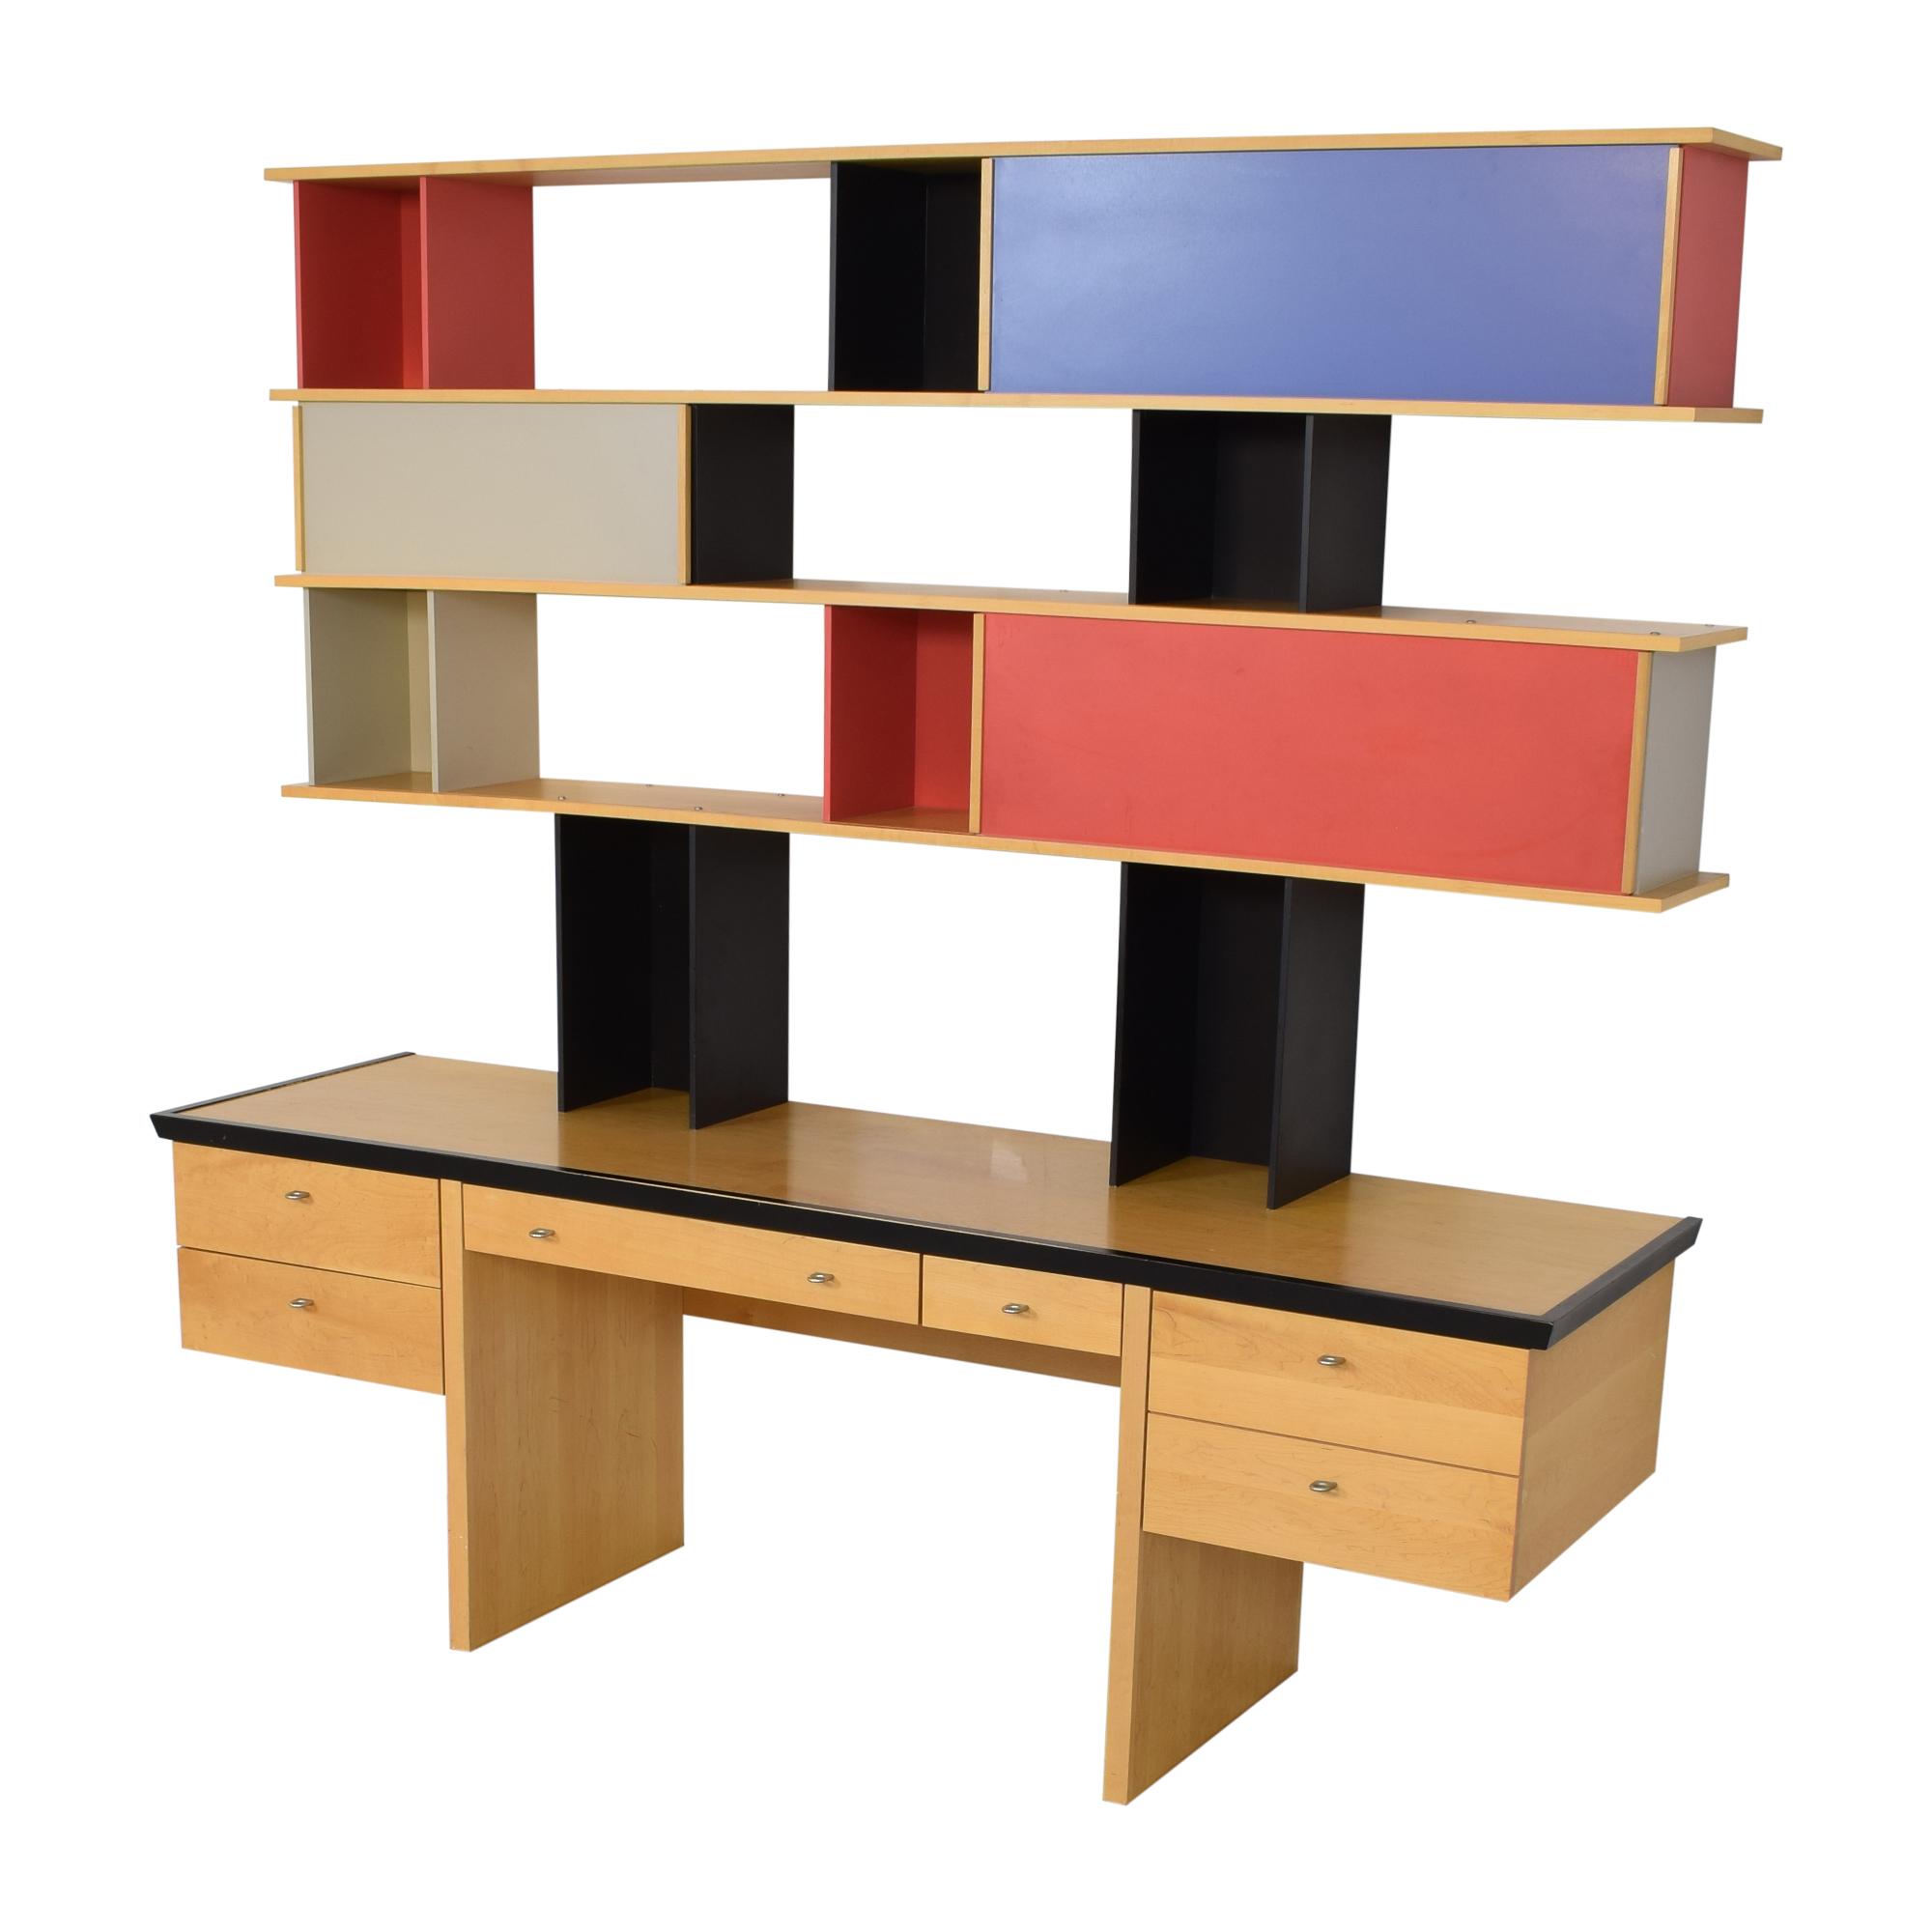 Vintage Mid Century Modular Wall Desk with Sliding Shelves price